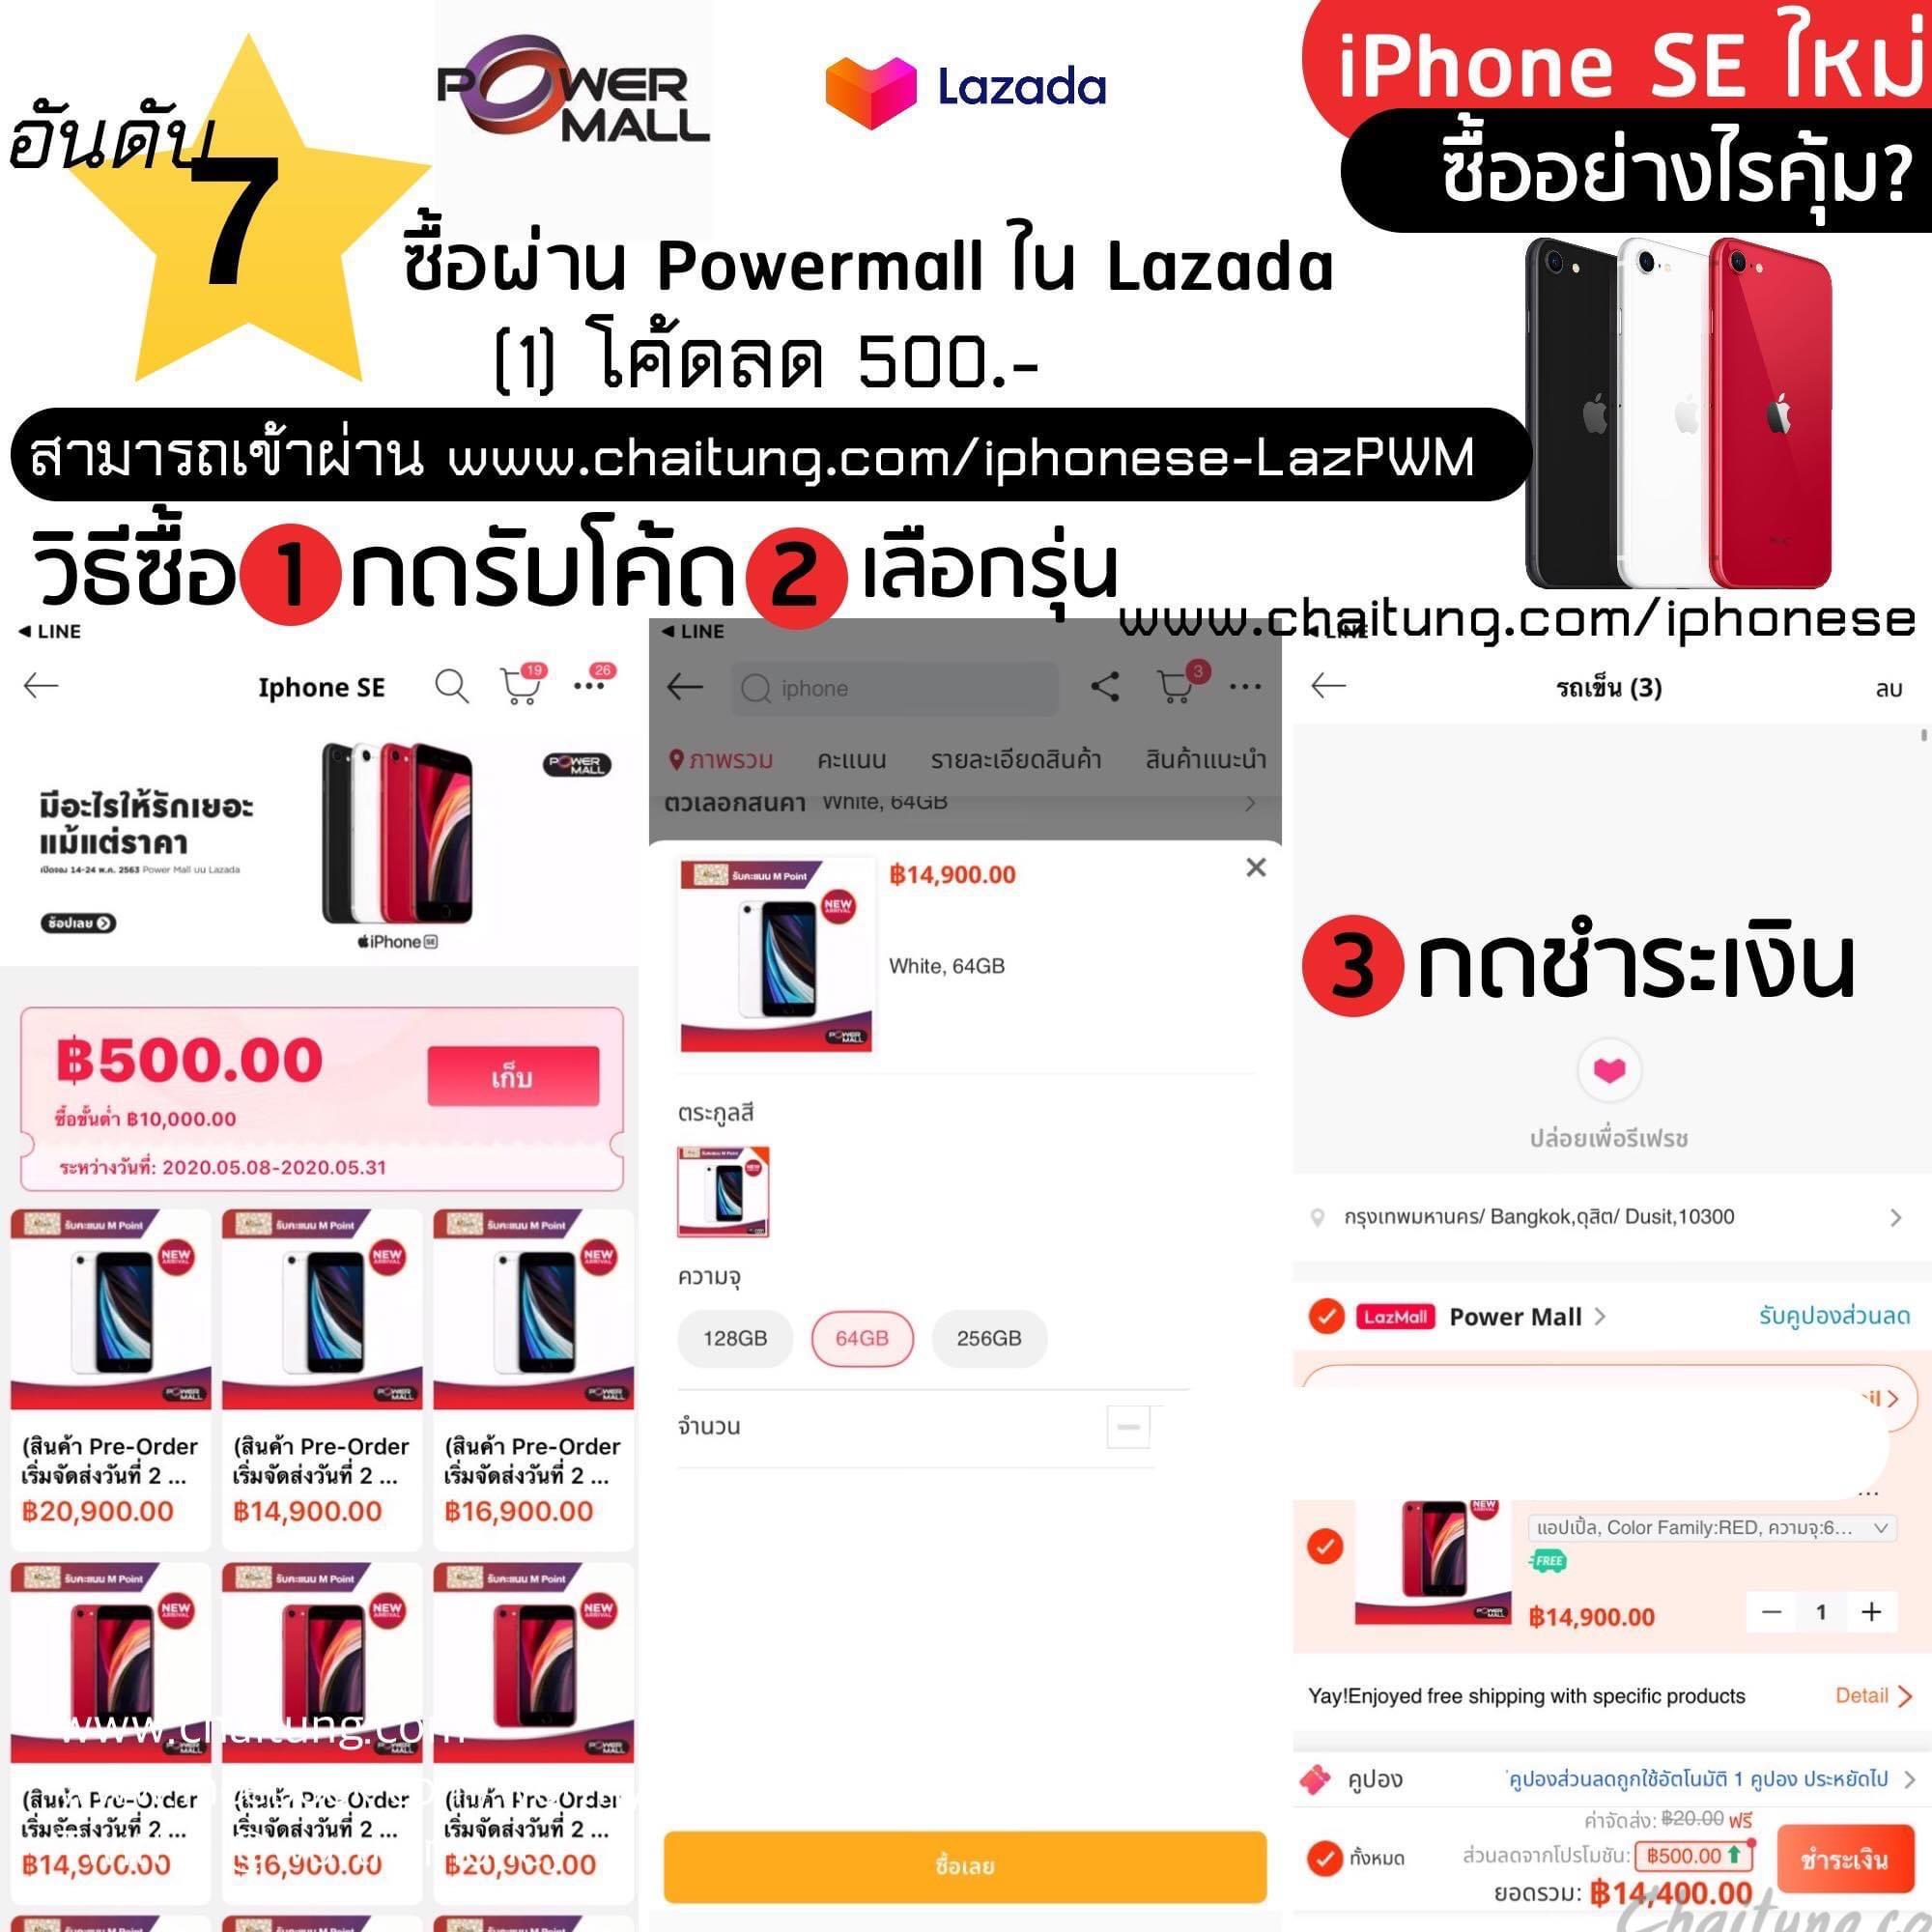 iphone SE powermall lazada